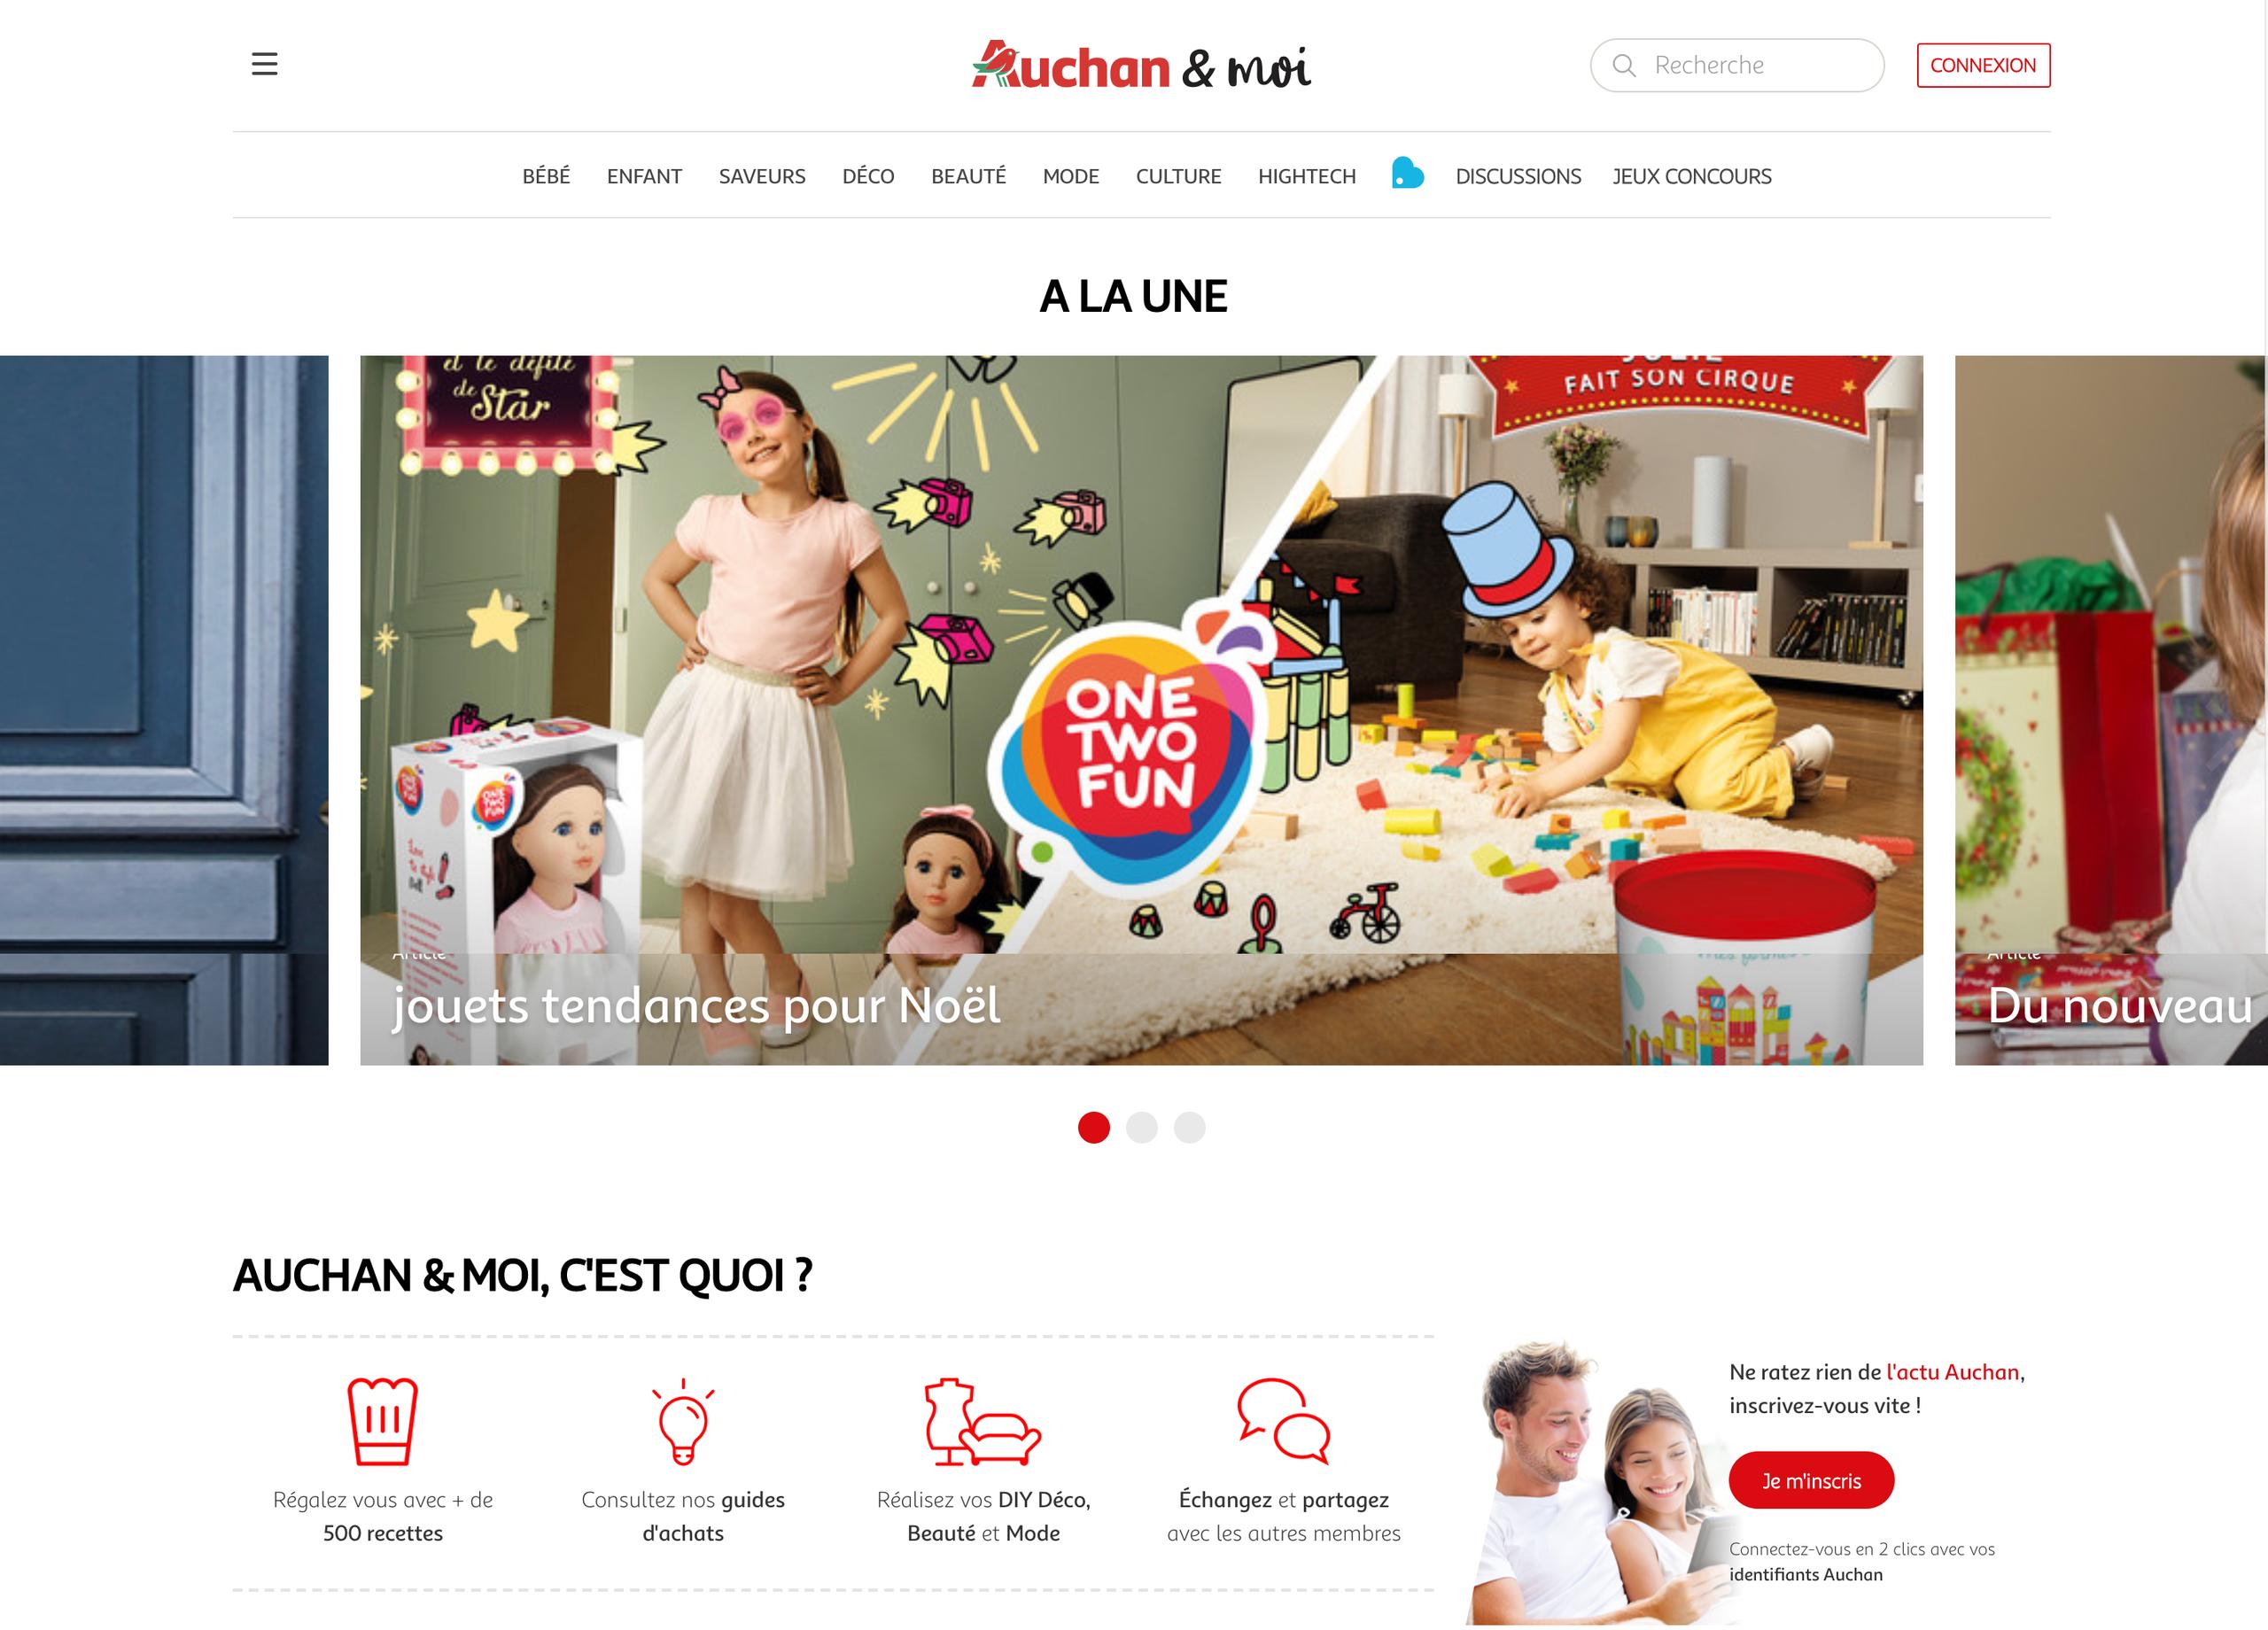 Auchan-et-moi